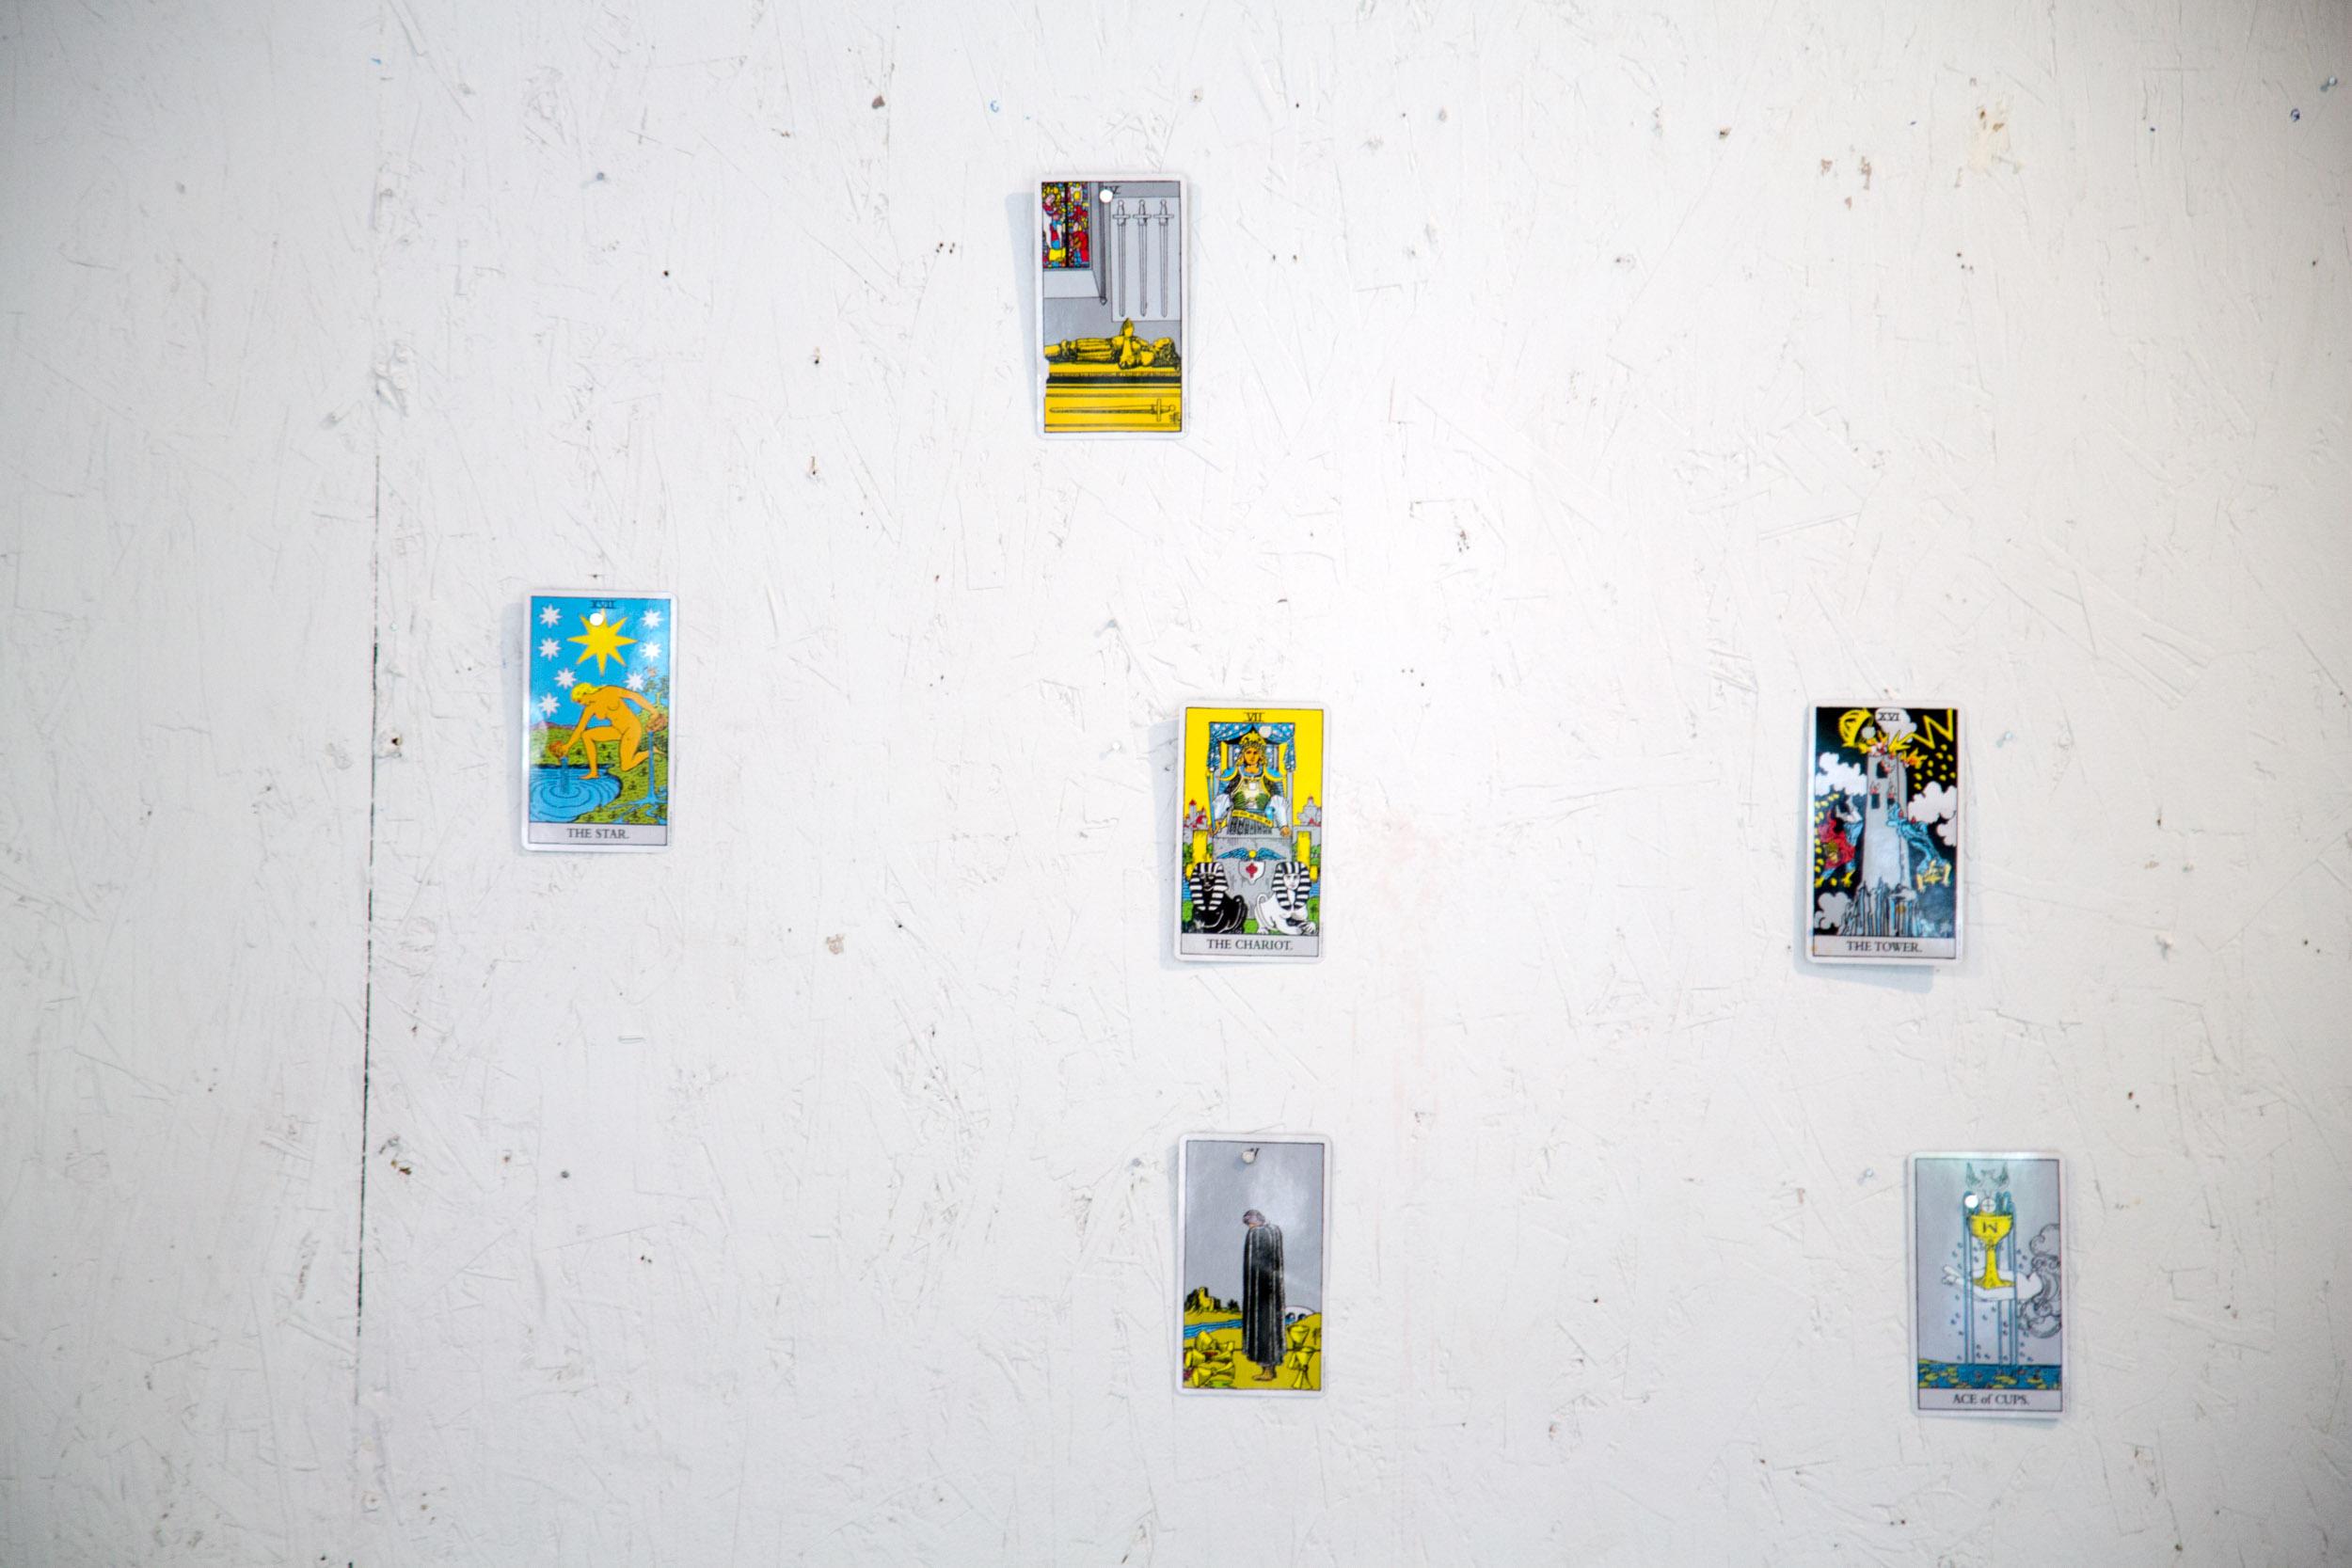 wassaic-project-artist-julia-norton-2018-08-29-10-38-48.jpg